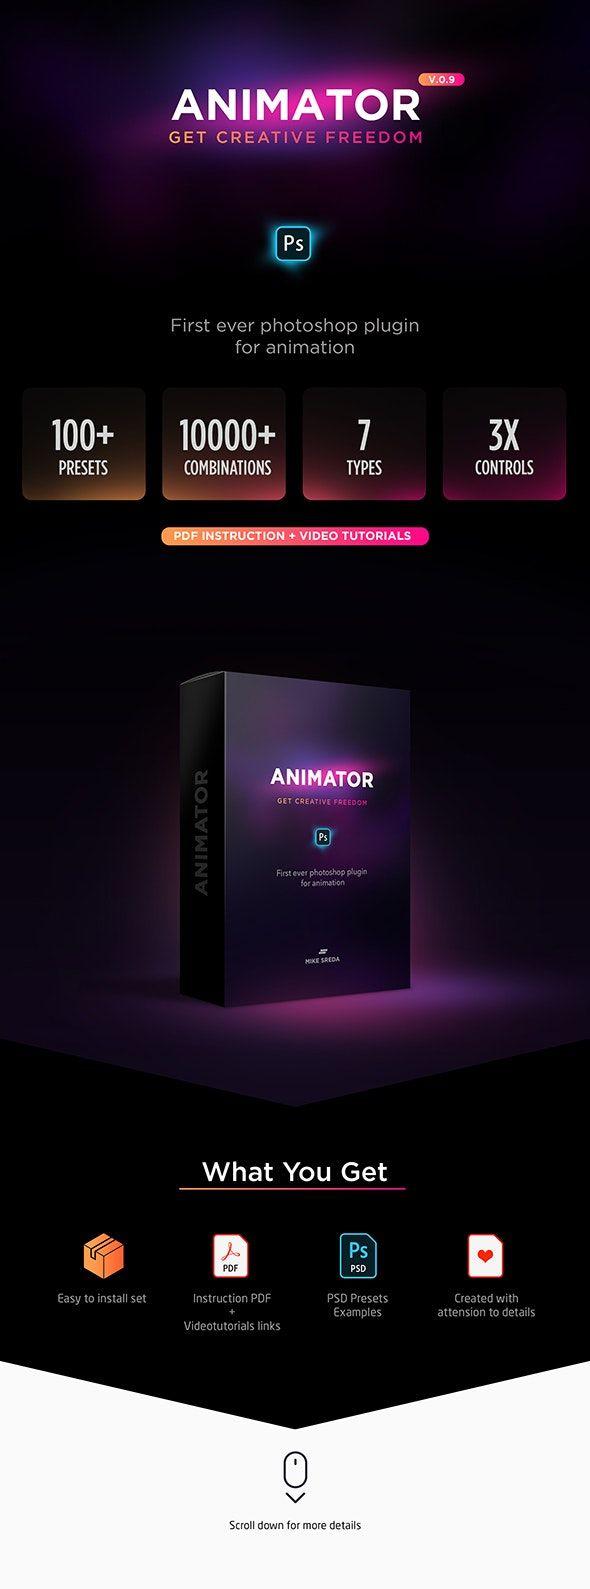 Creative Text Animator Photoshop Plugin download @graphicriver #creativeart #art #photoshop #plug-in #download #animator #text #webdesign #graphicdesign